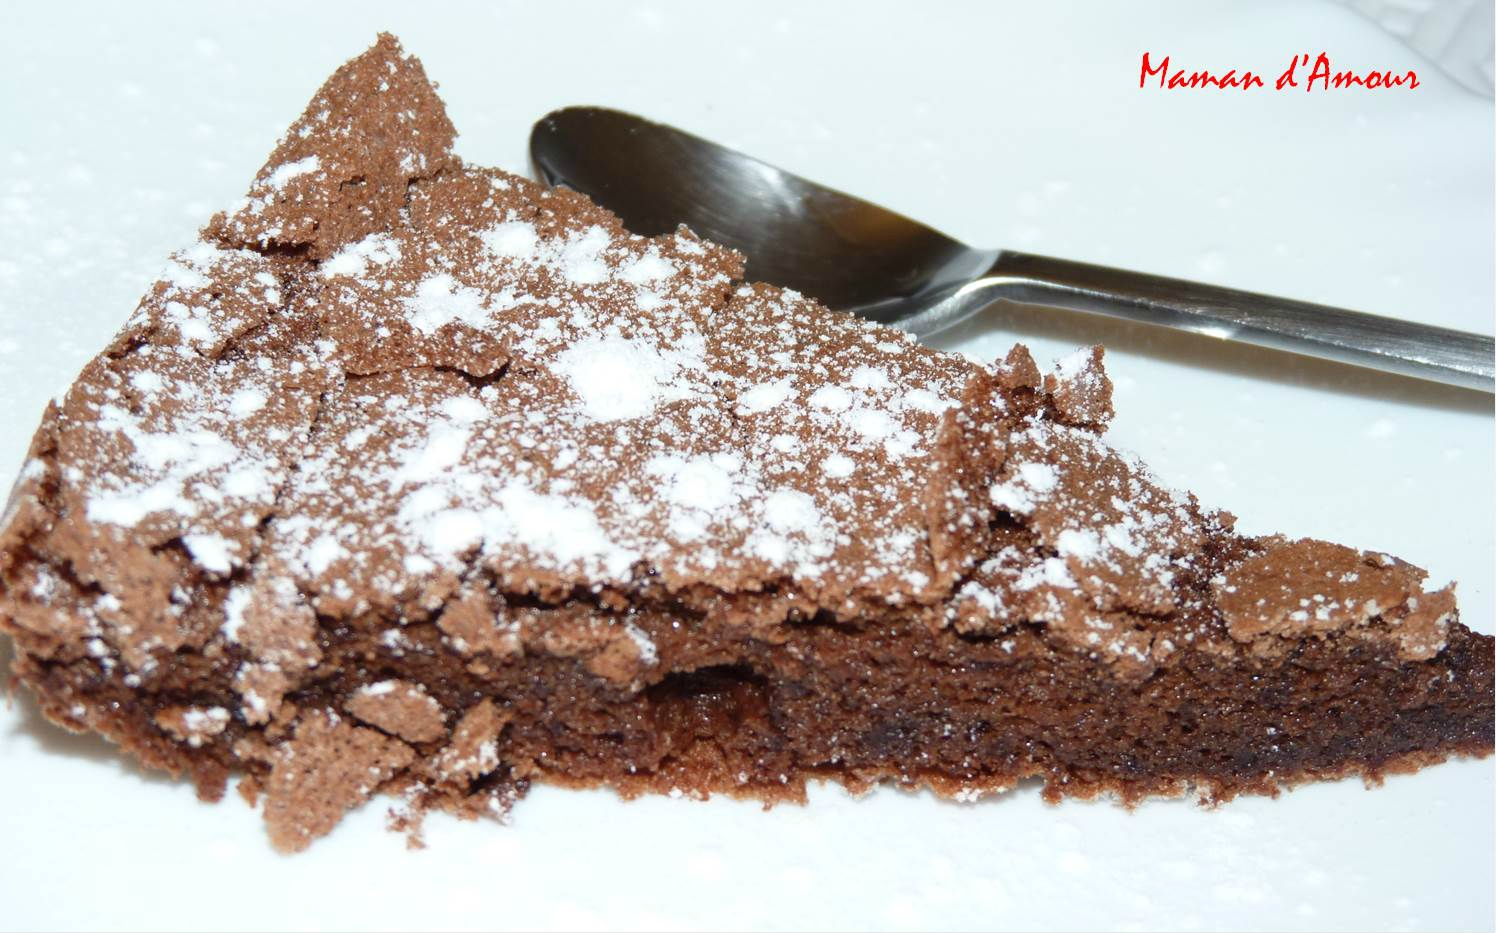 Gateau au chocolat sans farine fondant et ultra l ger ma maman d 39 amour - Gateau au chocolat sans farine ...